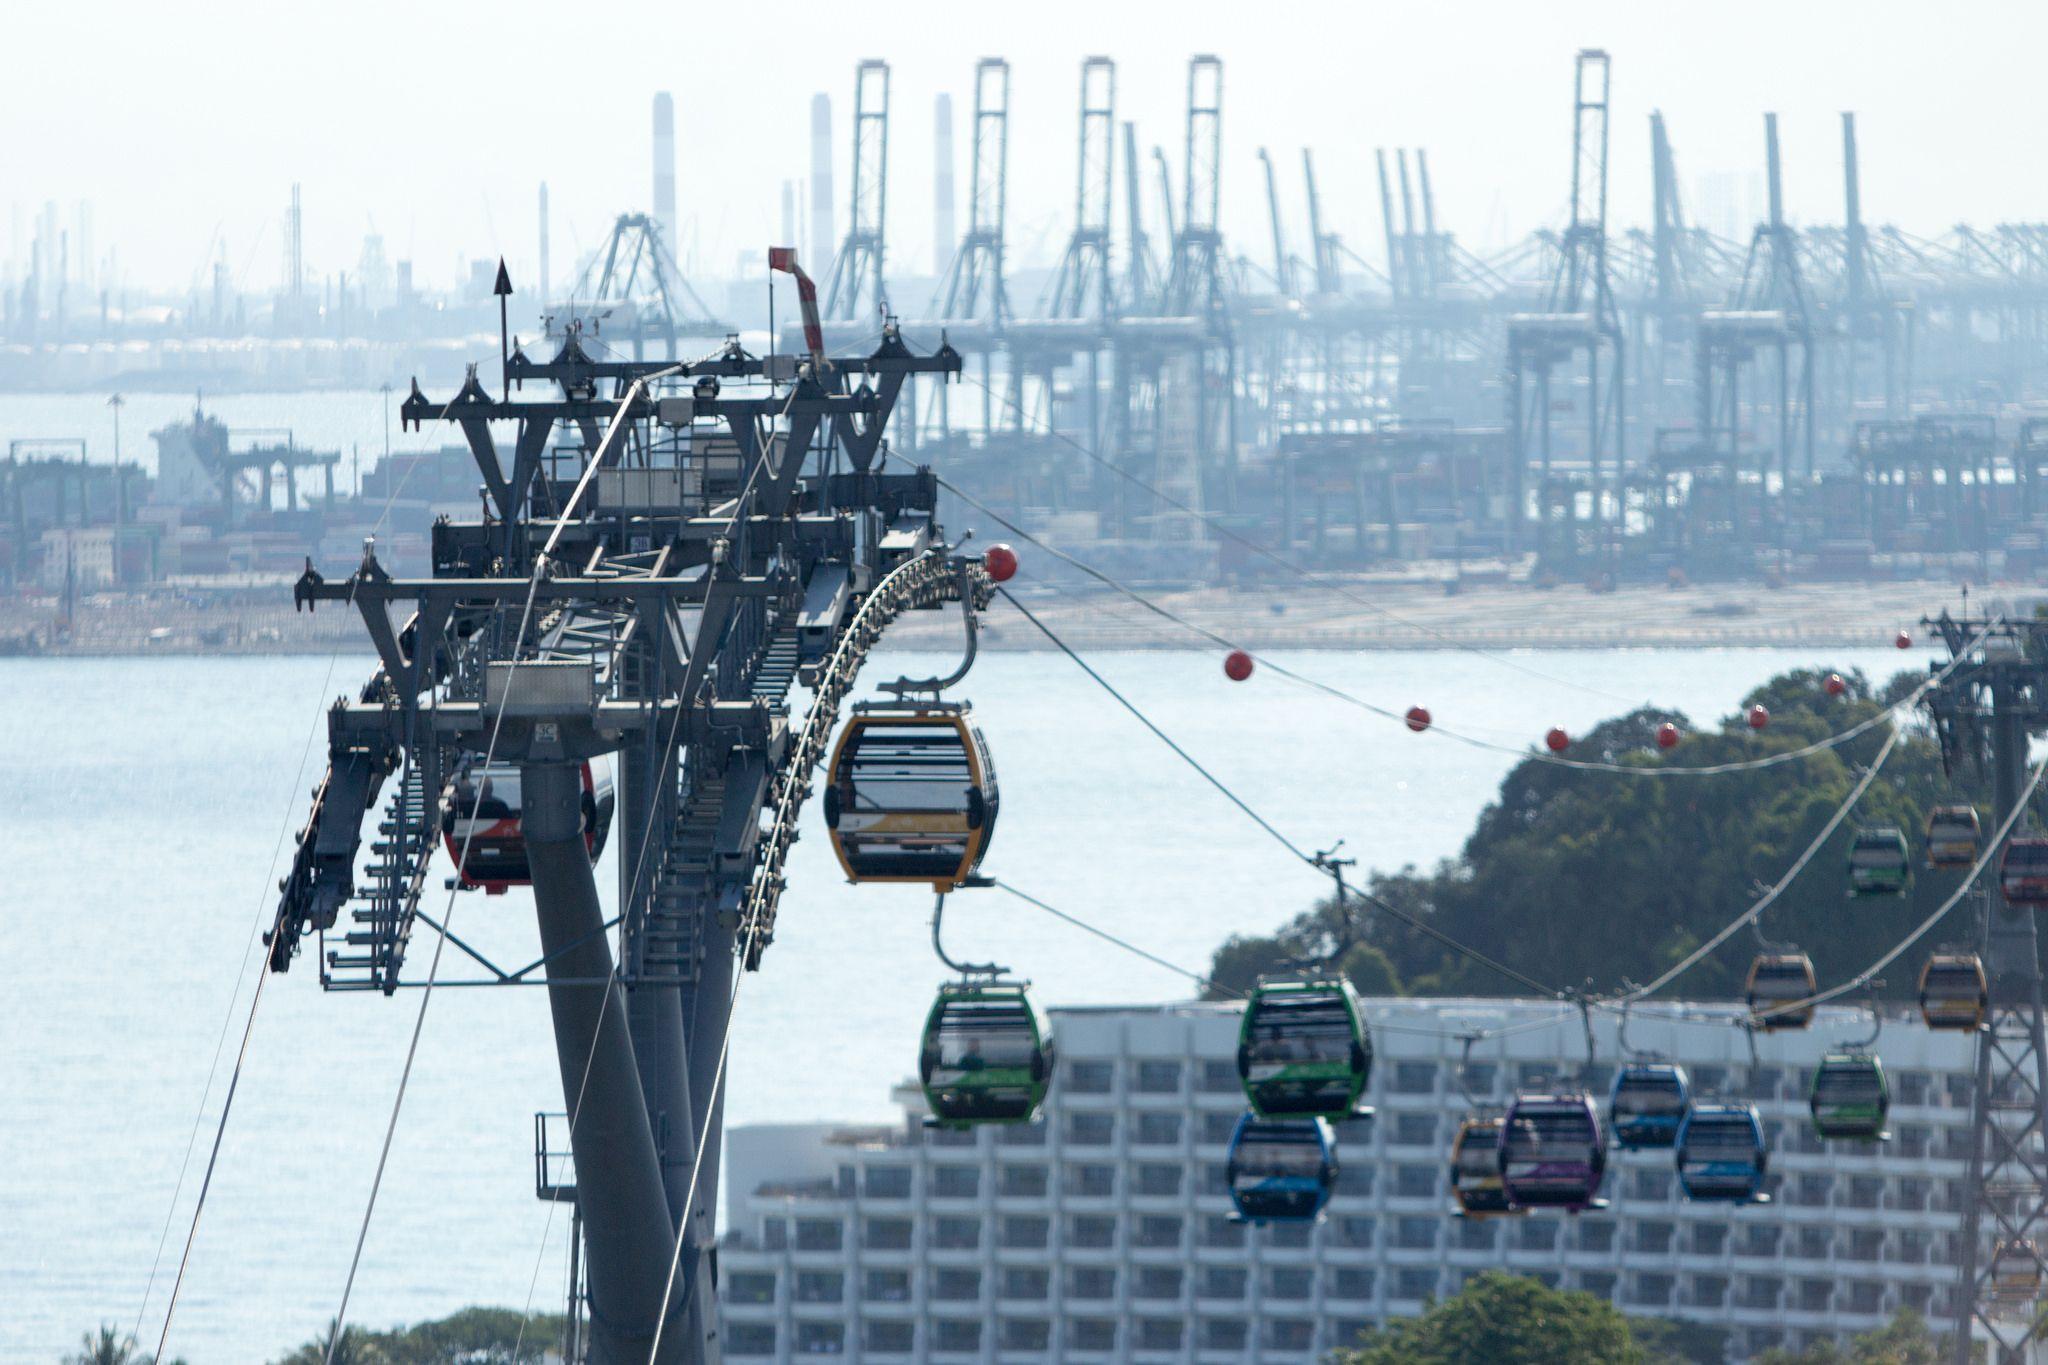 Cable Car Sky Ride Ski Lift Singapore